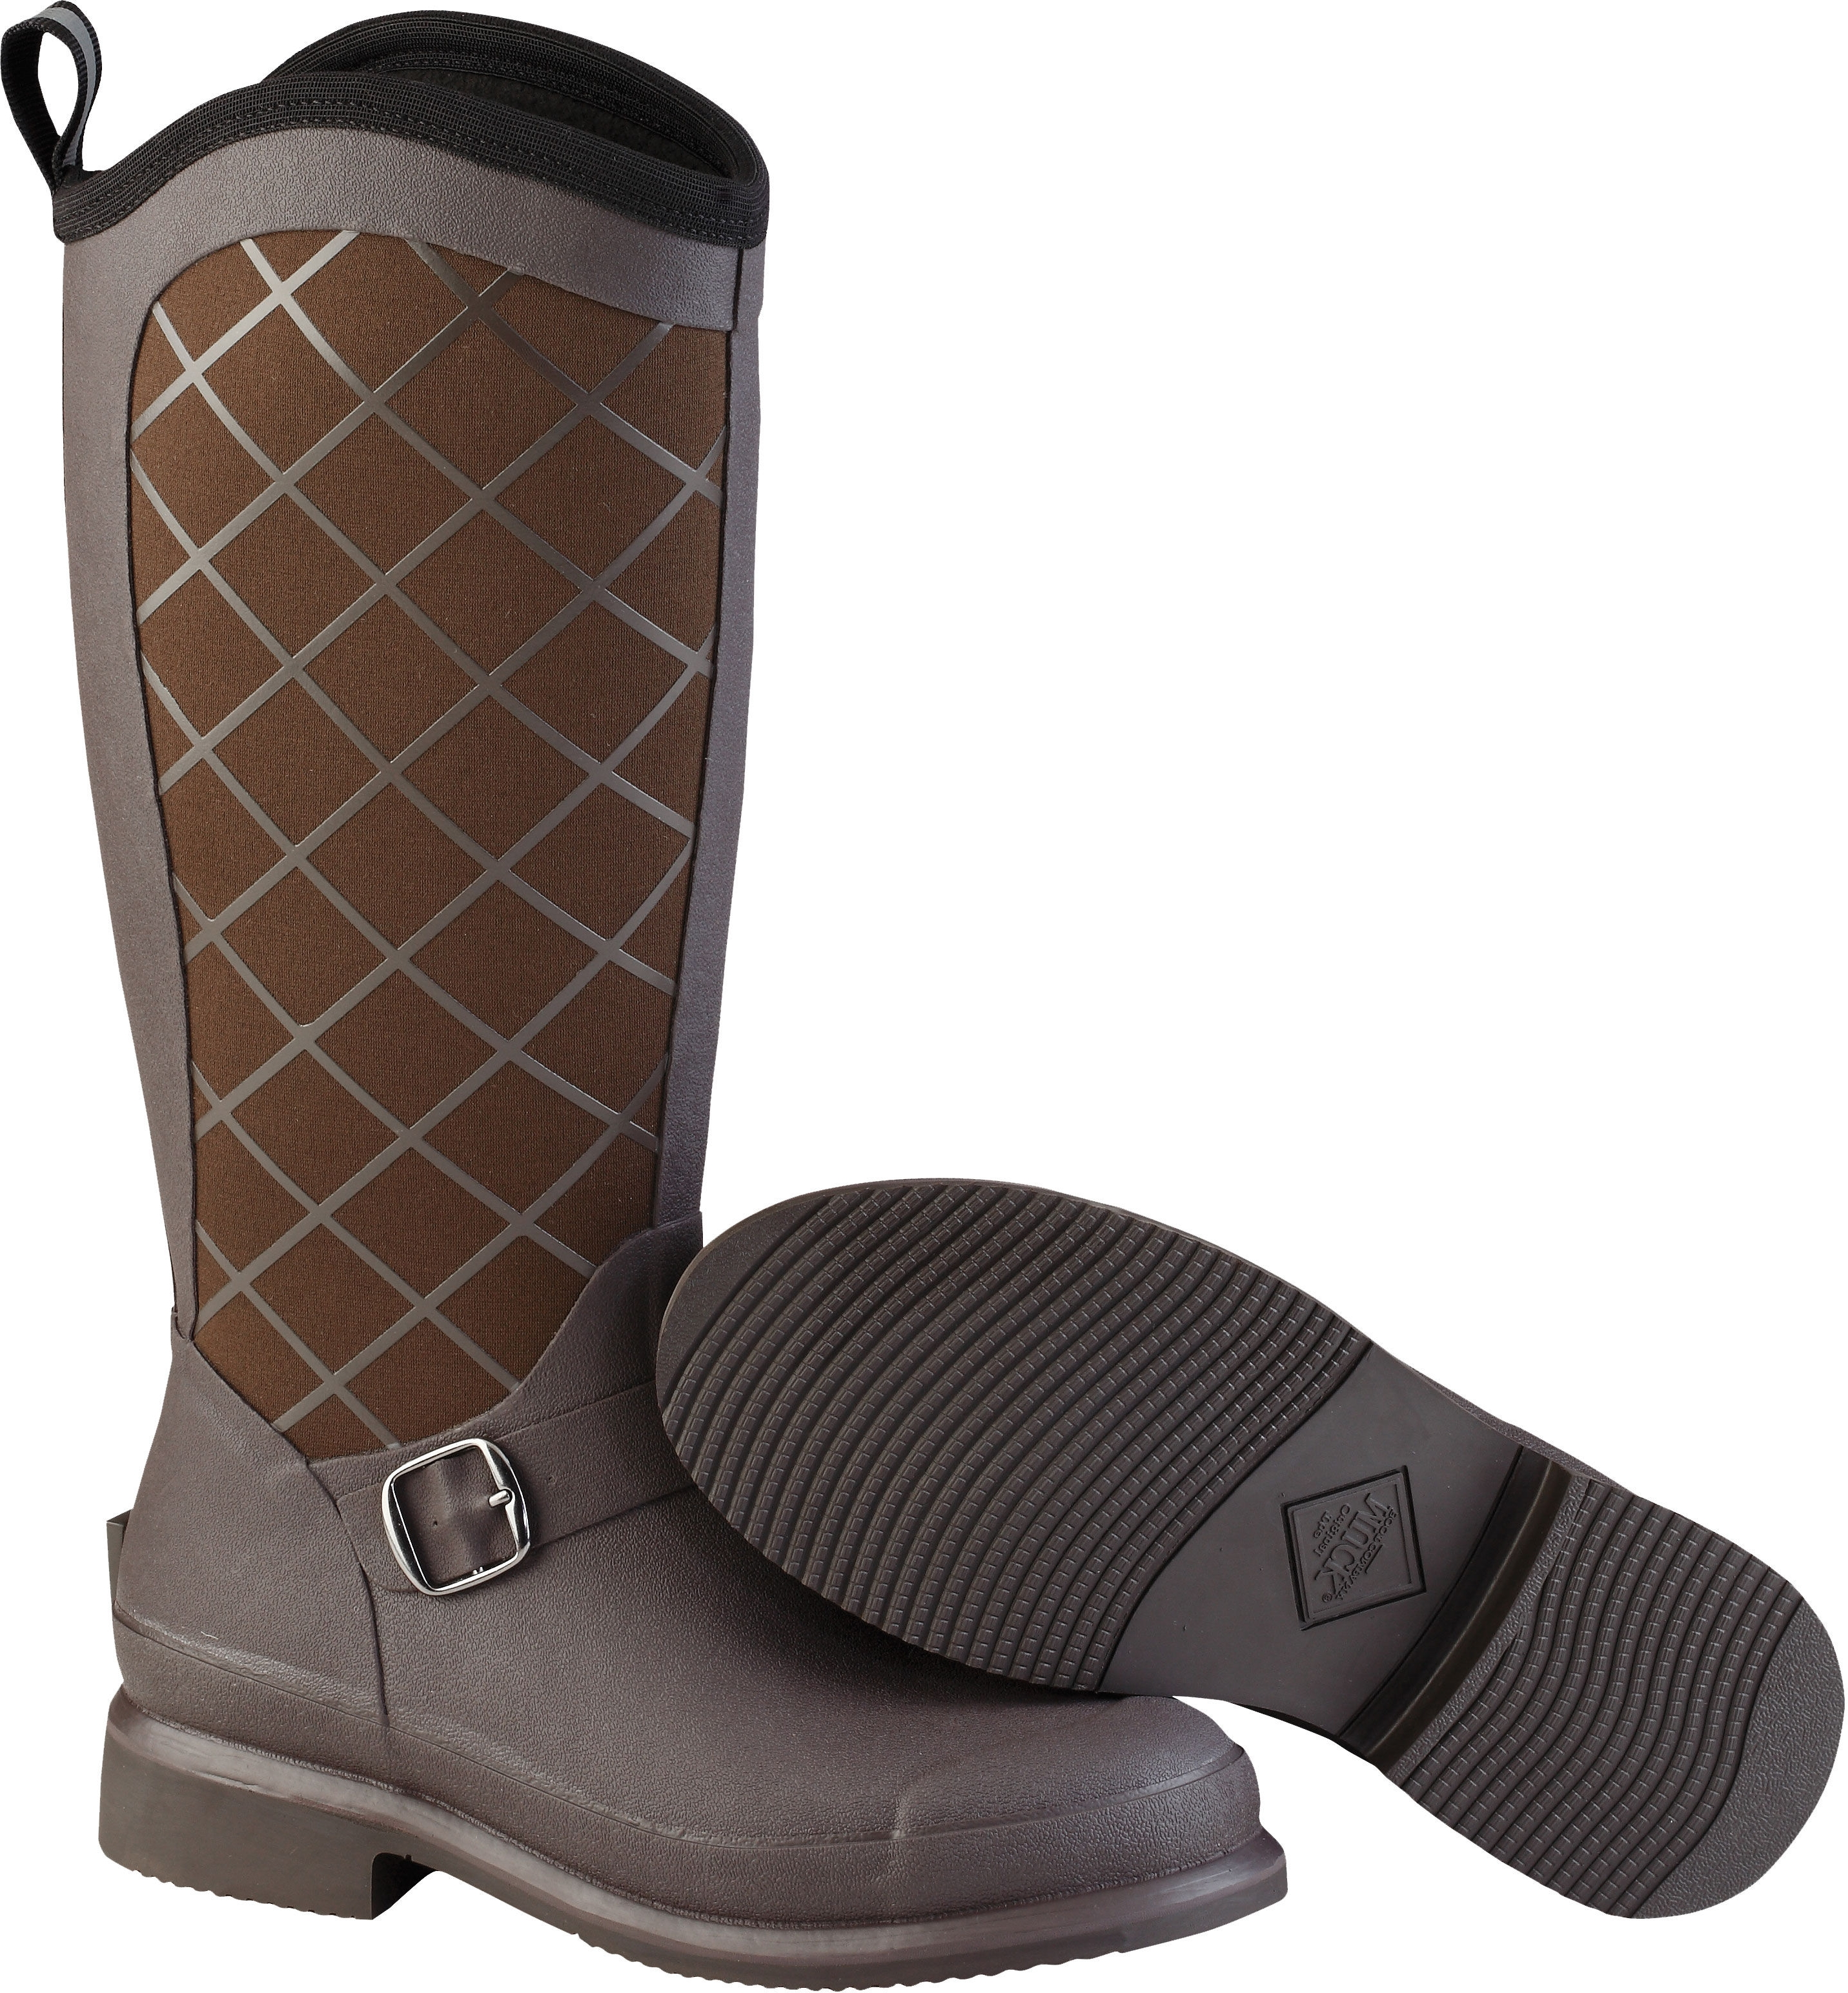 Muck Boots Women's Pacy II